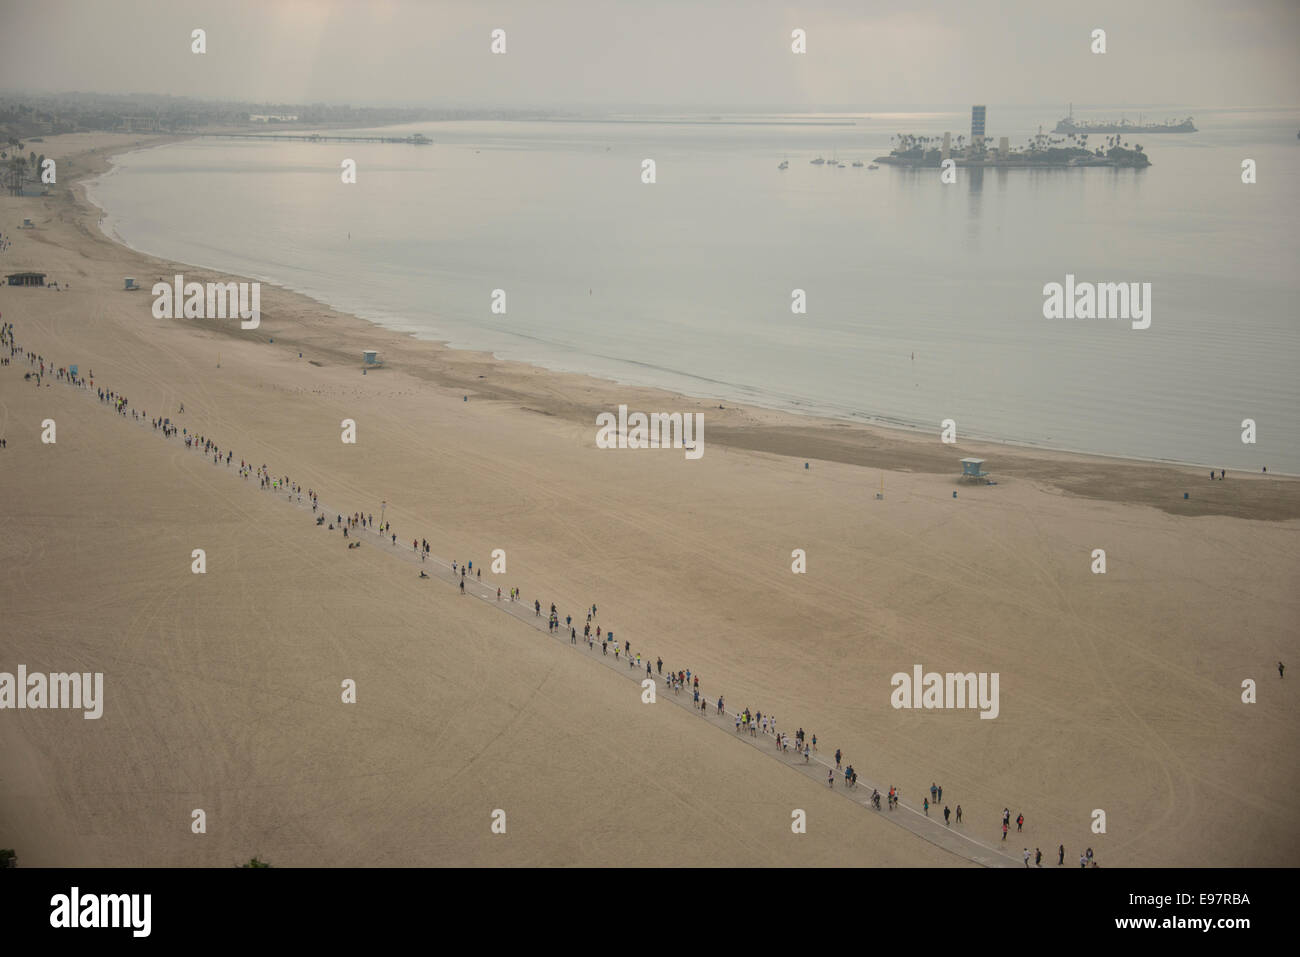 Runners running the Long Beach marathon on path along beach beside Pacific Ocean Long Beach Southern California - Stock Image